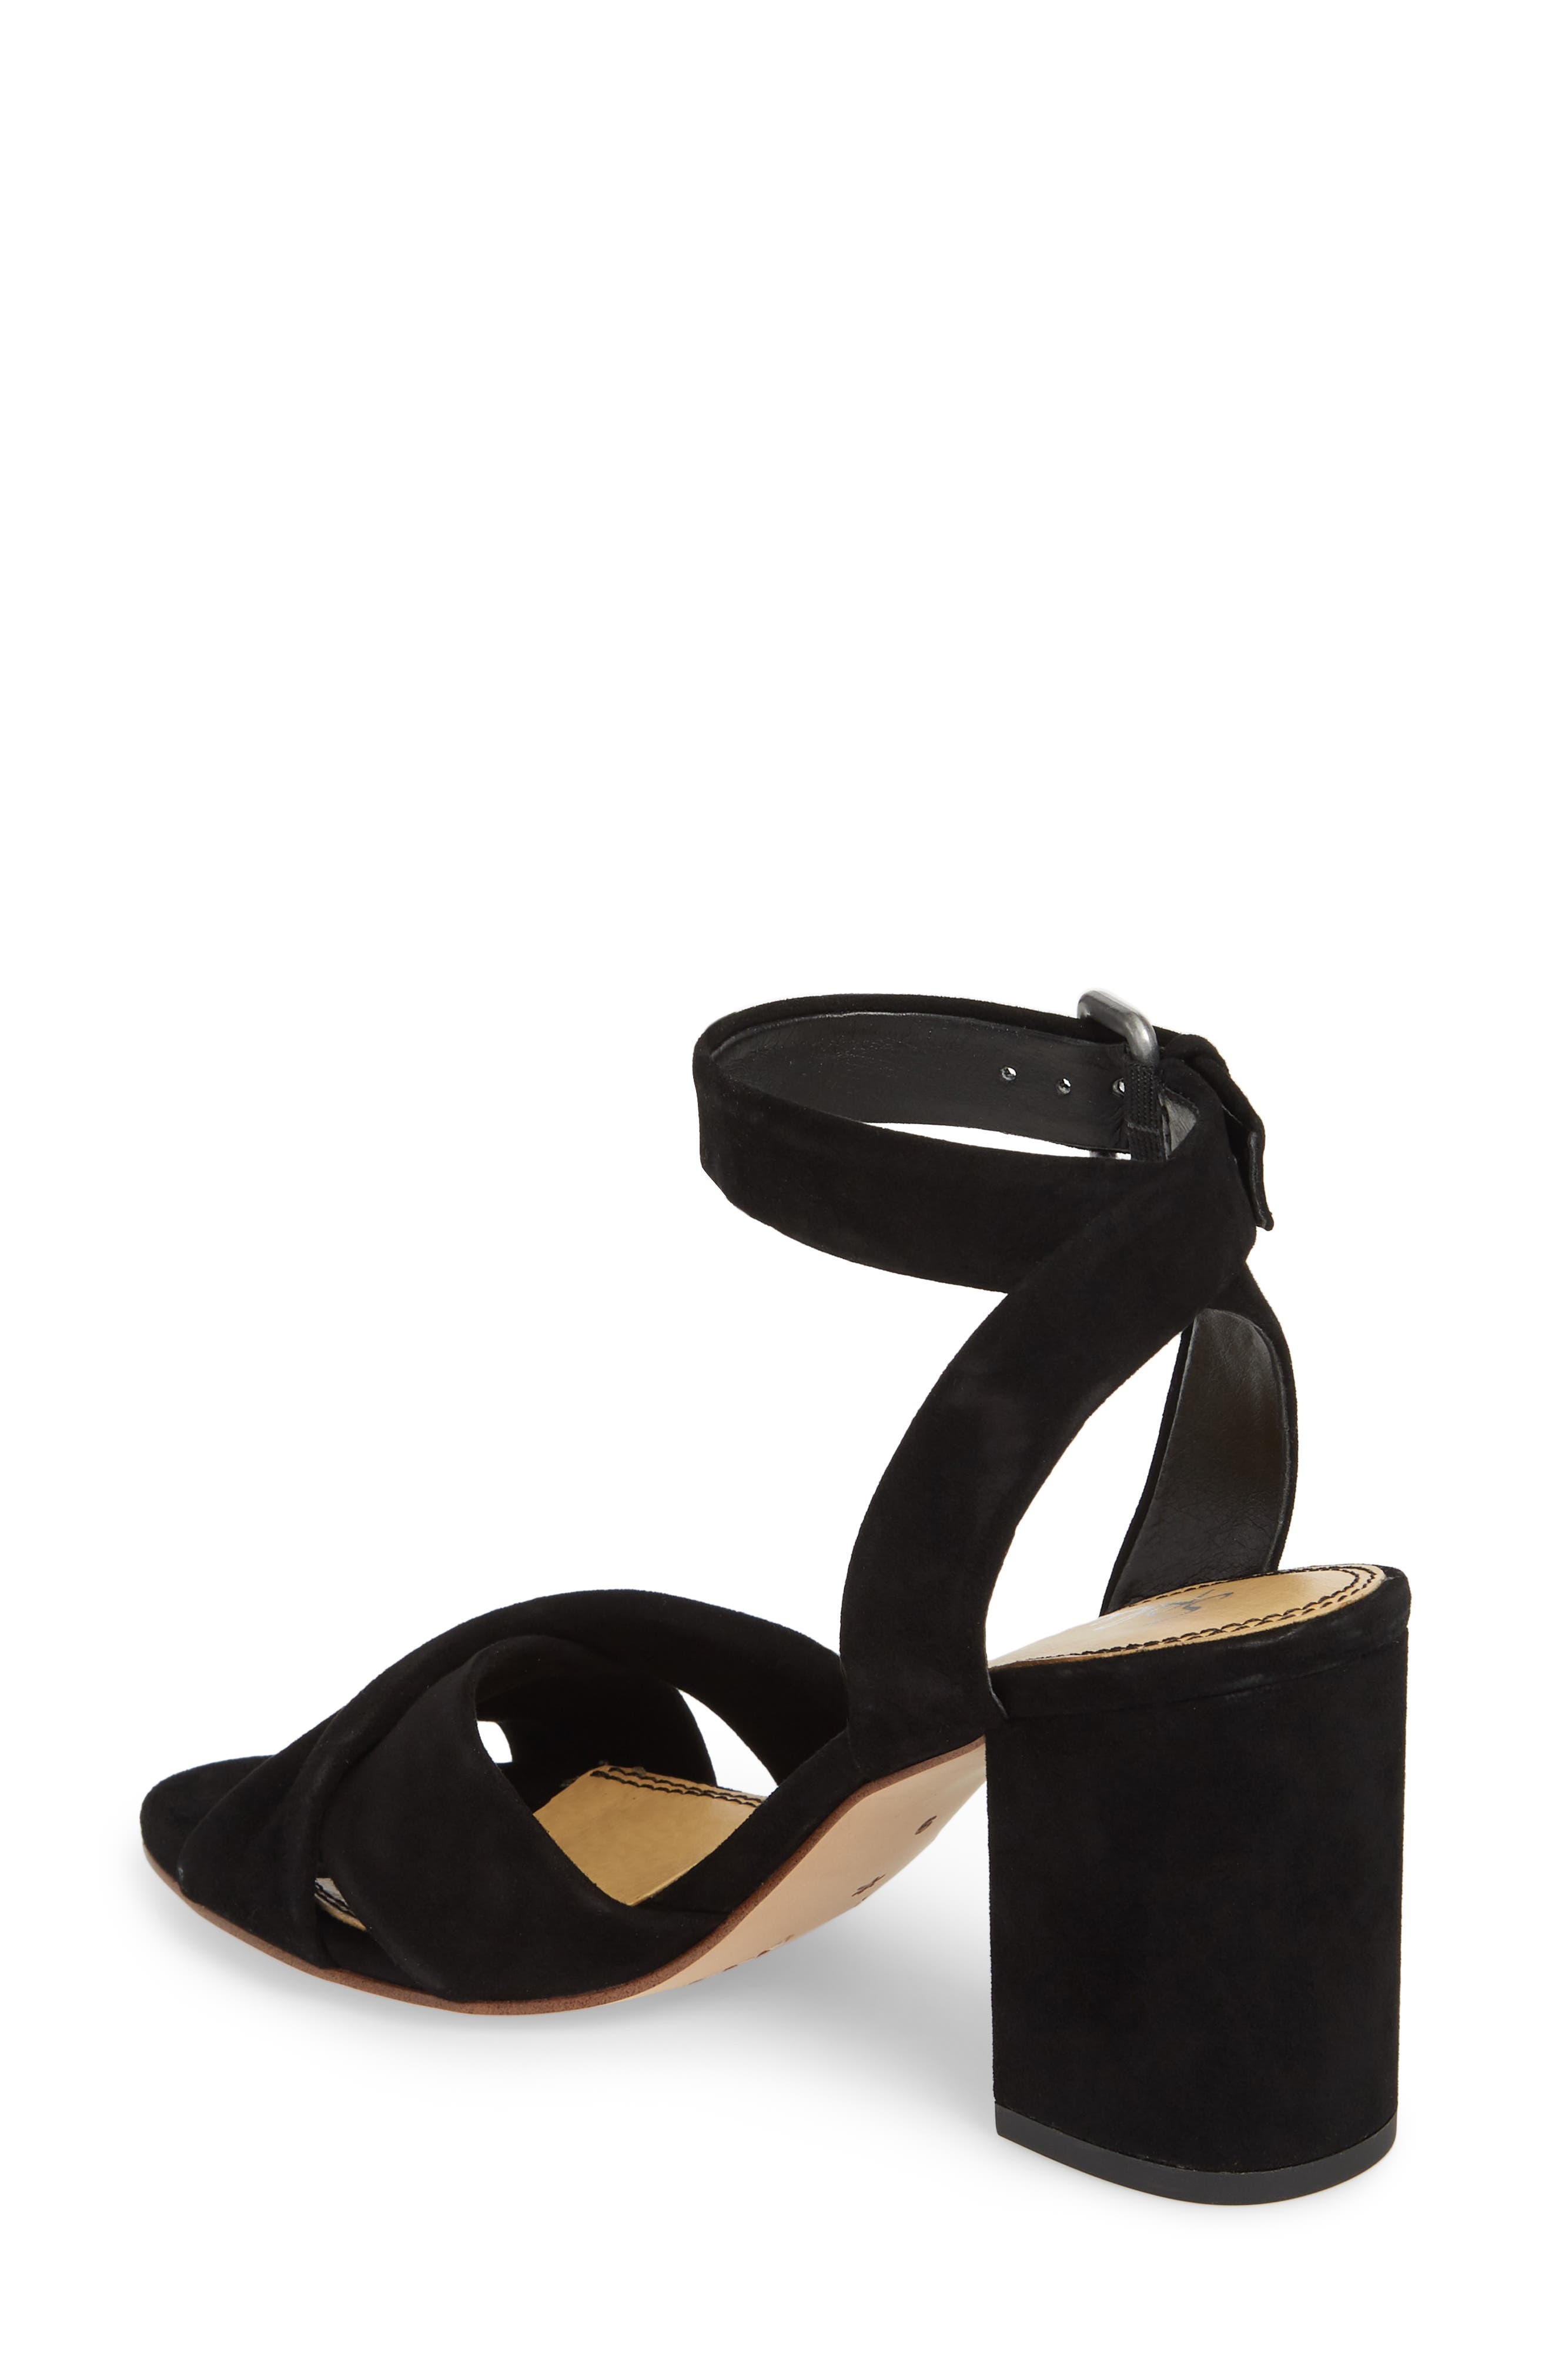 Fairy Block Heel Sandal,                             Alternate thumbnail 2, color,                             Black Suede